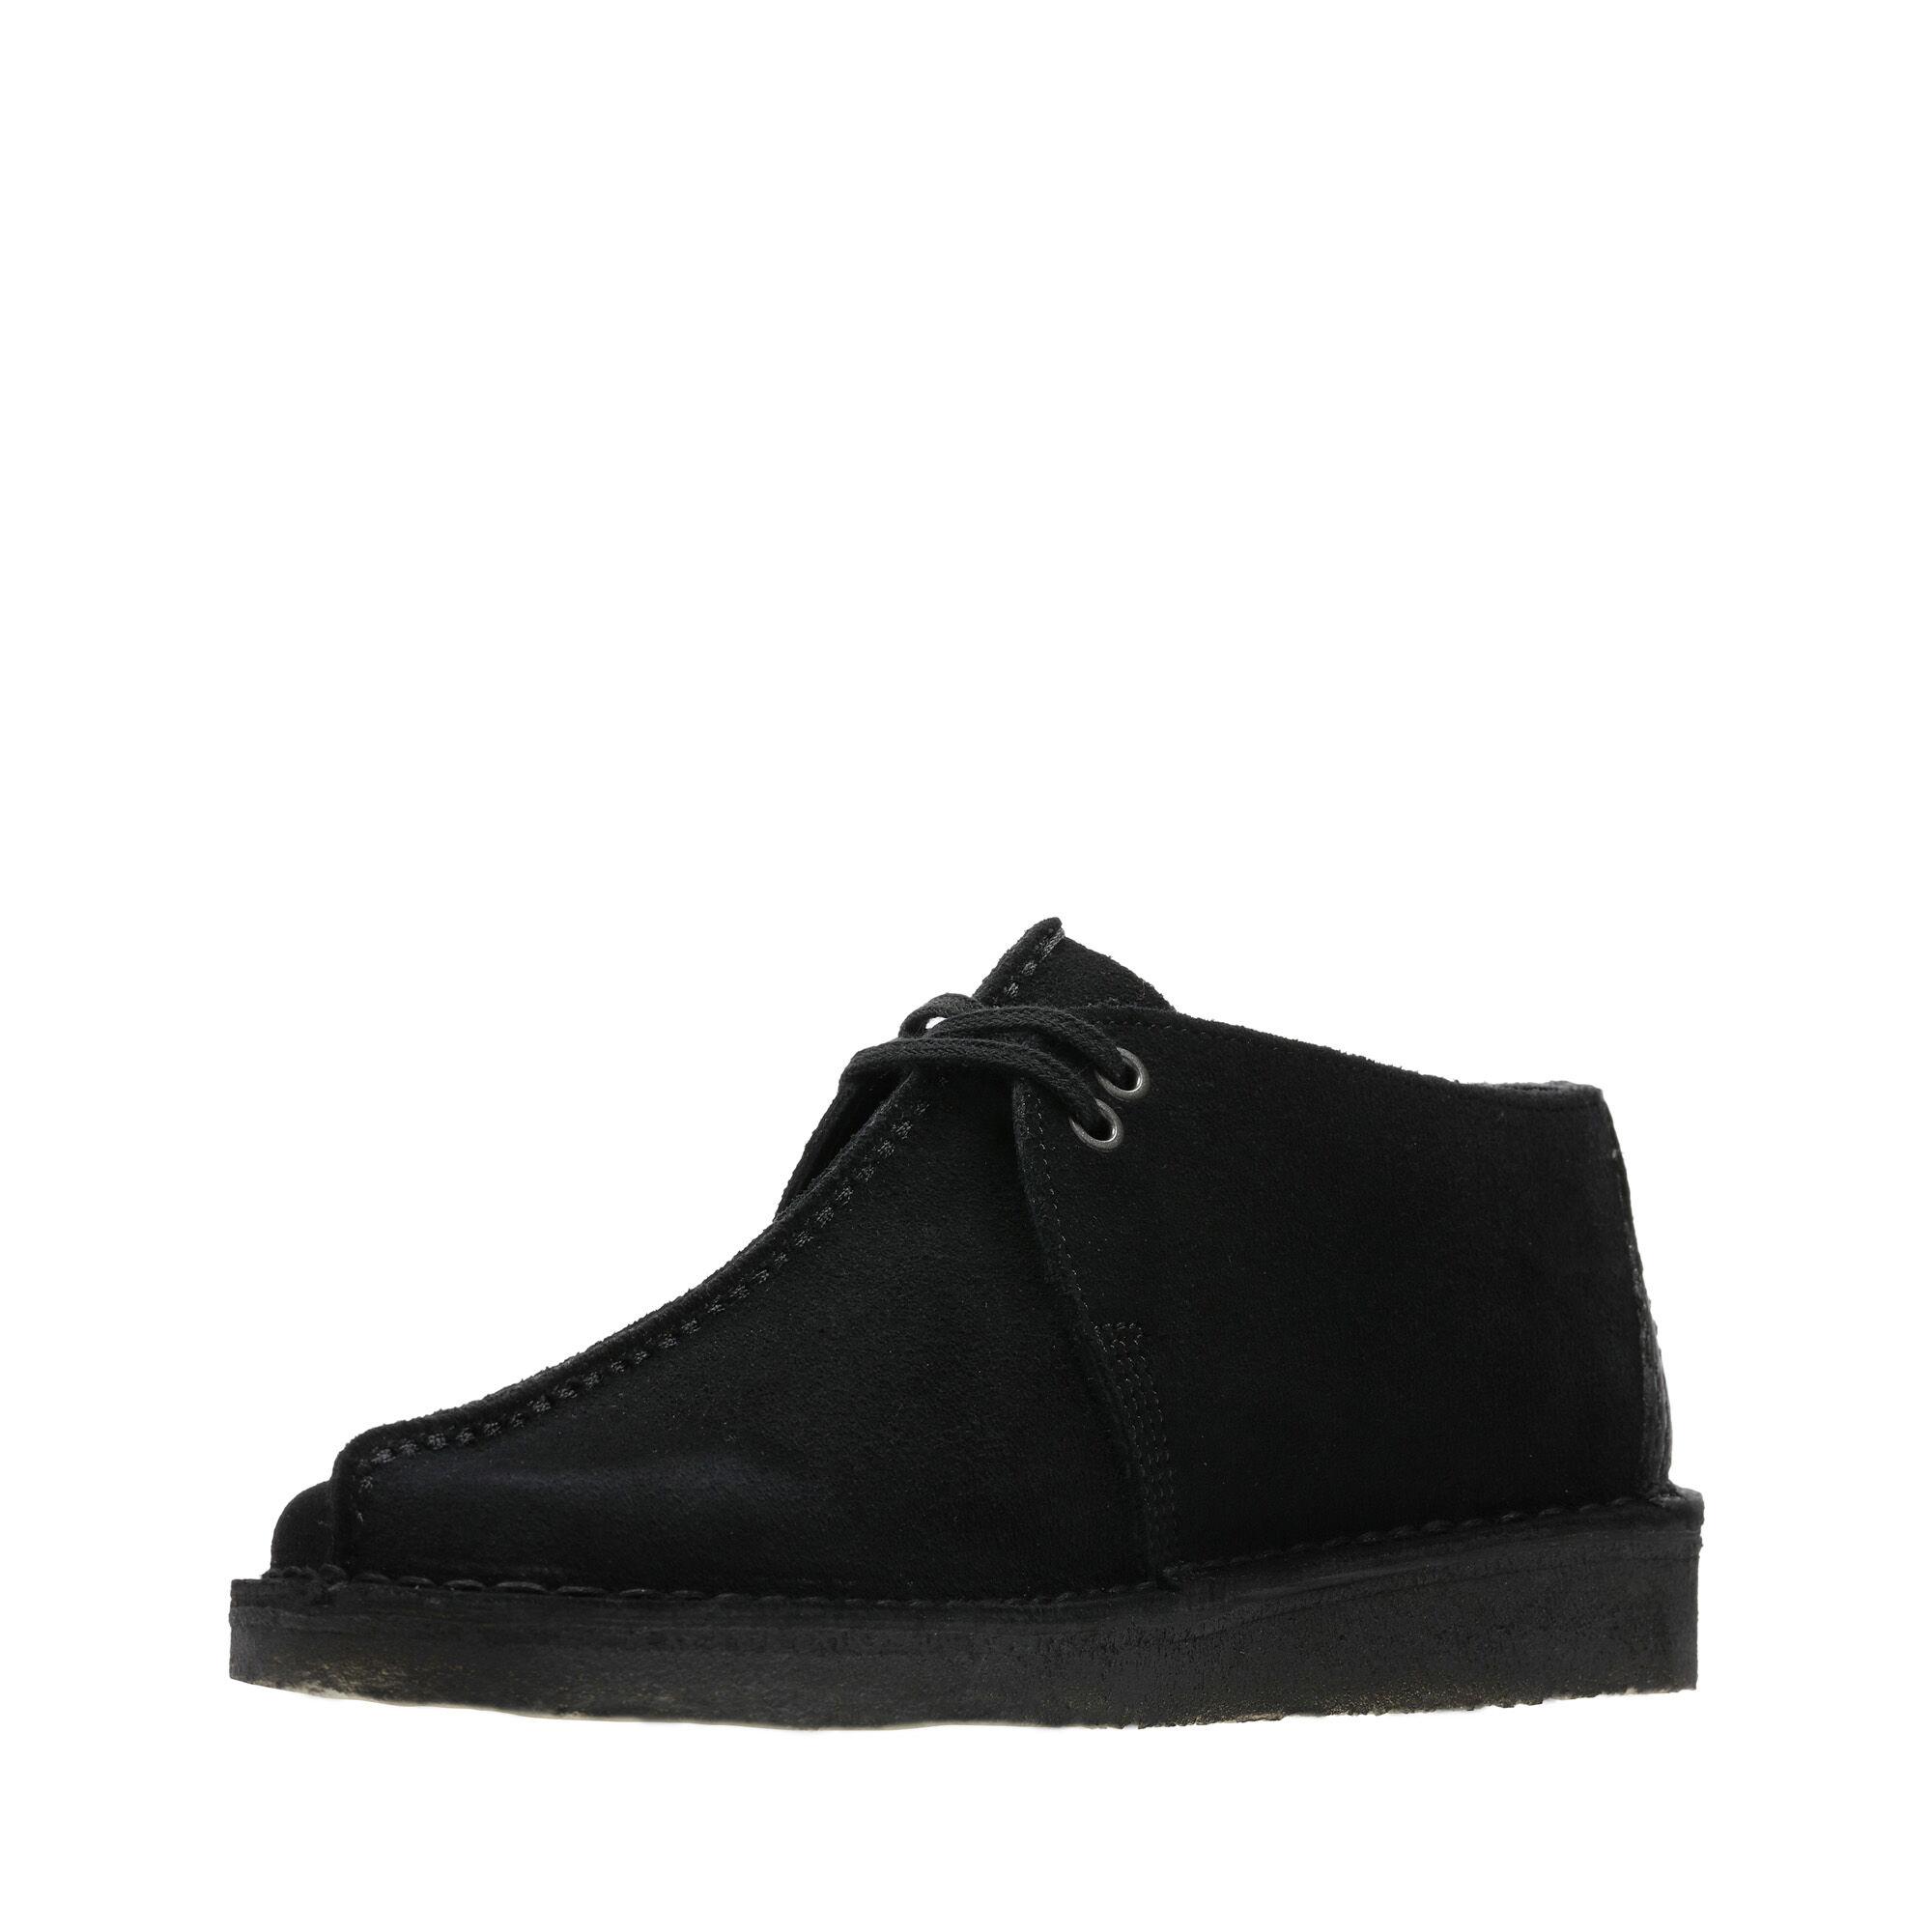 Black Suede Shoes - Desert Trek   Clarks